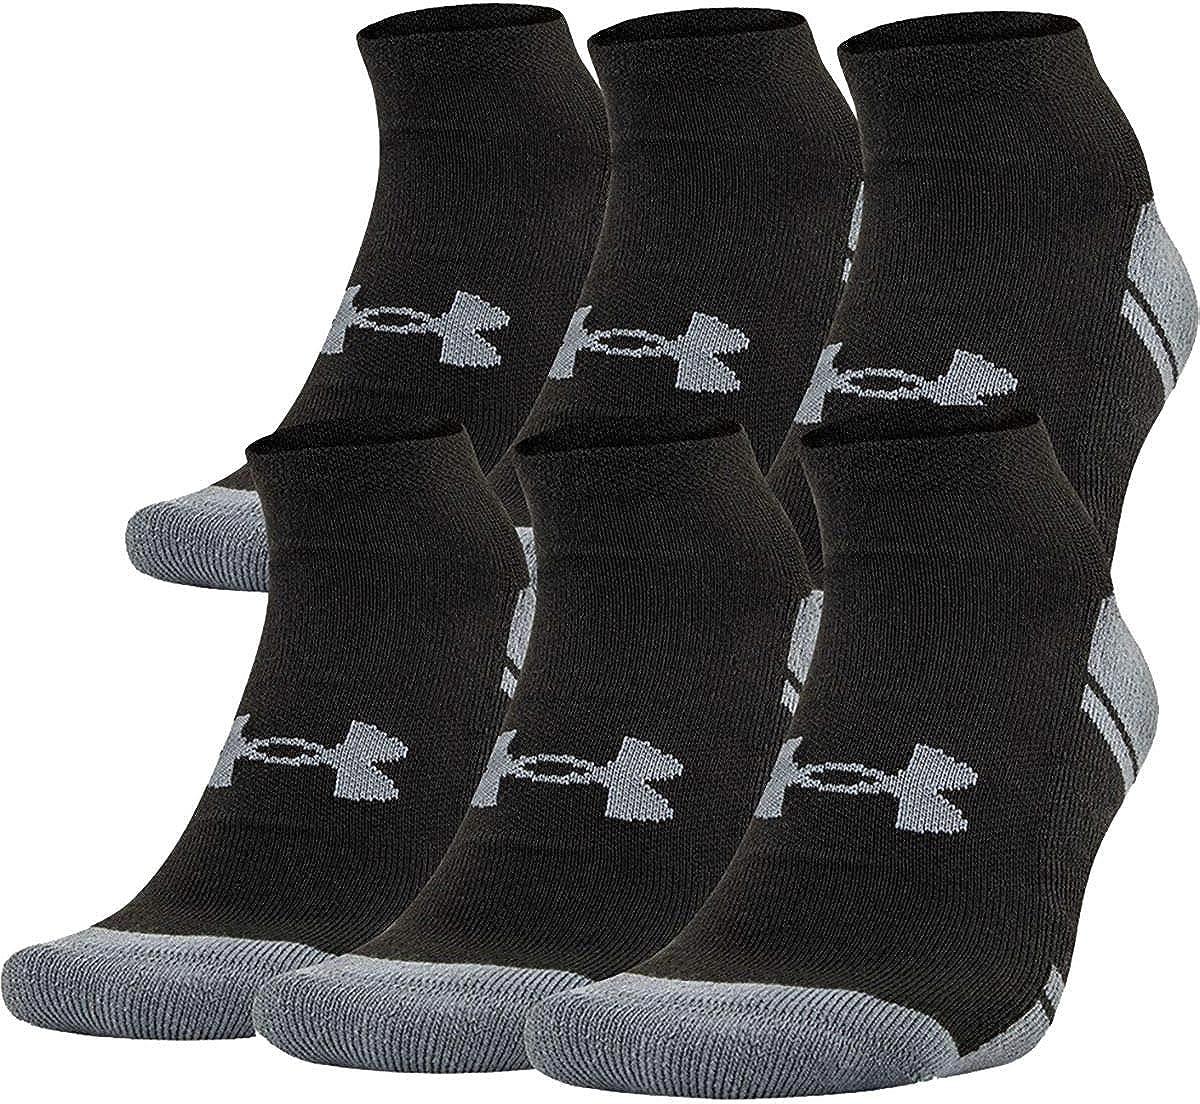 Under Armour Resistor 3.0 No Show Sock - 6-Pack - Men's Black/Graphite, 10.0-13.0